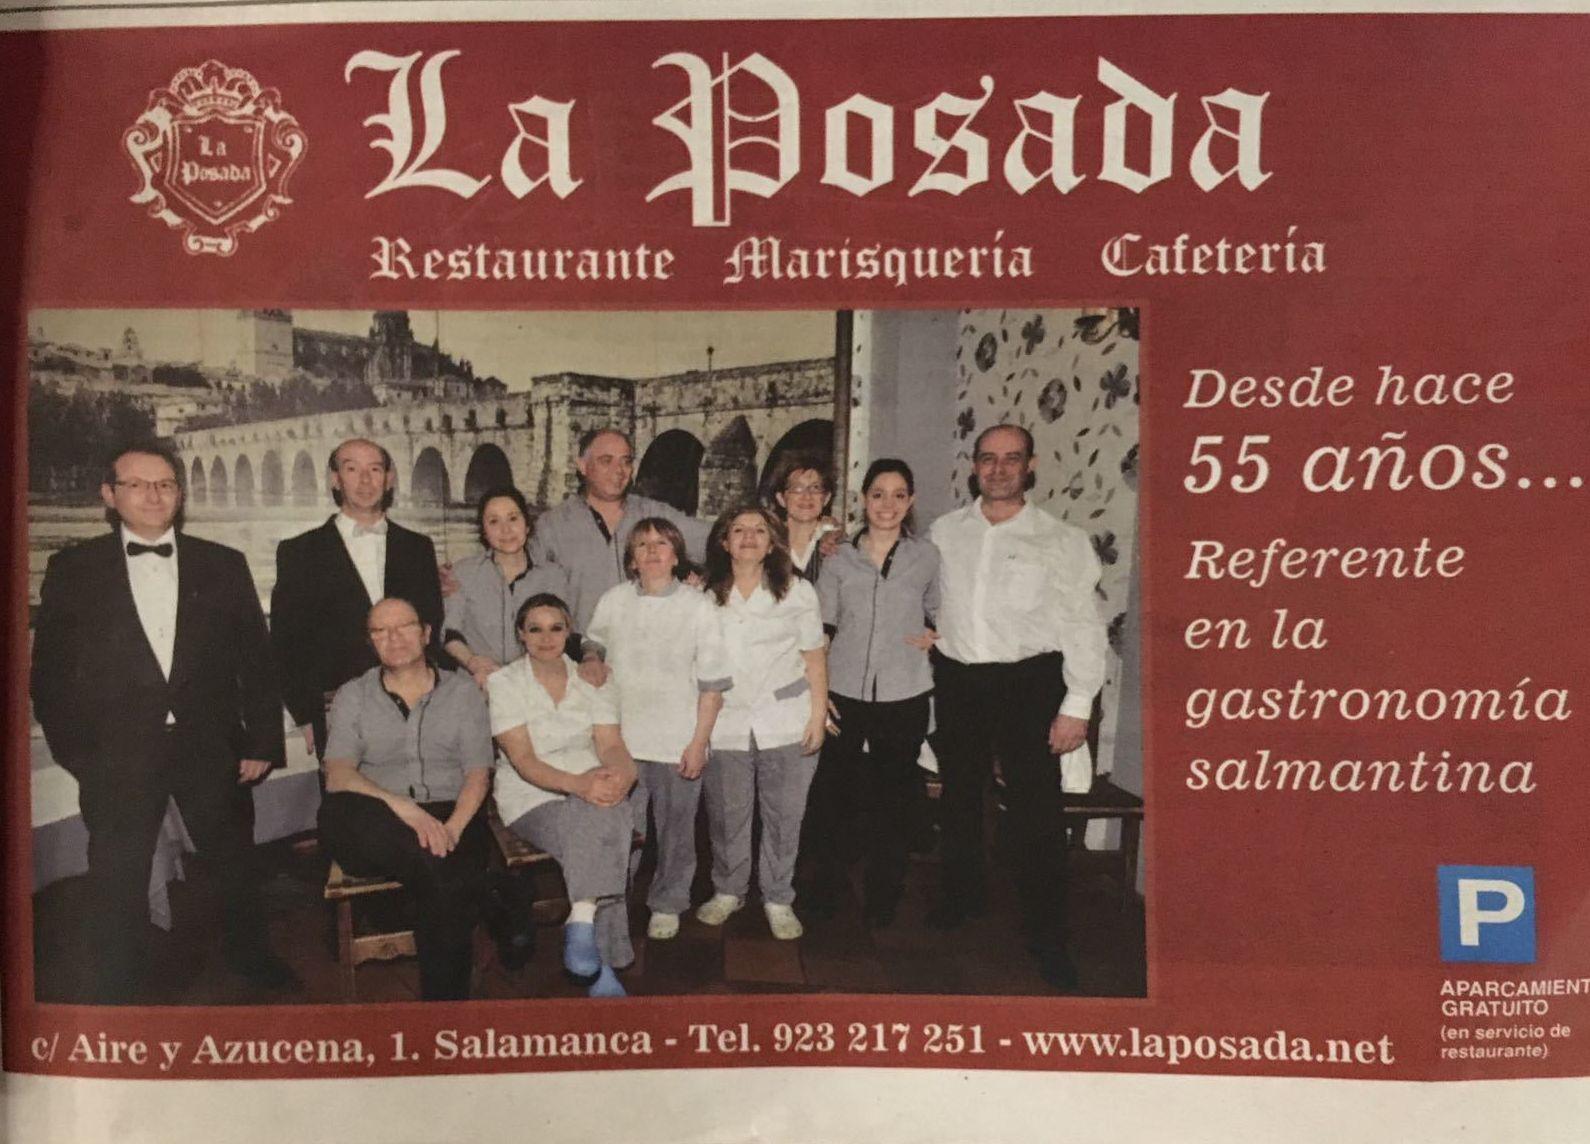 Cocina tradicional castellana en Salamanca